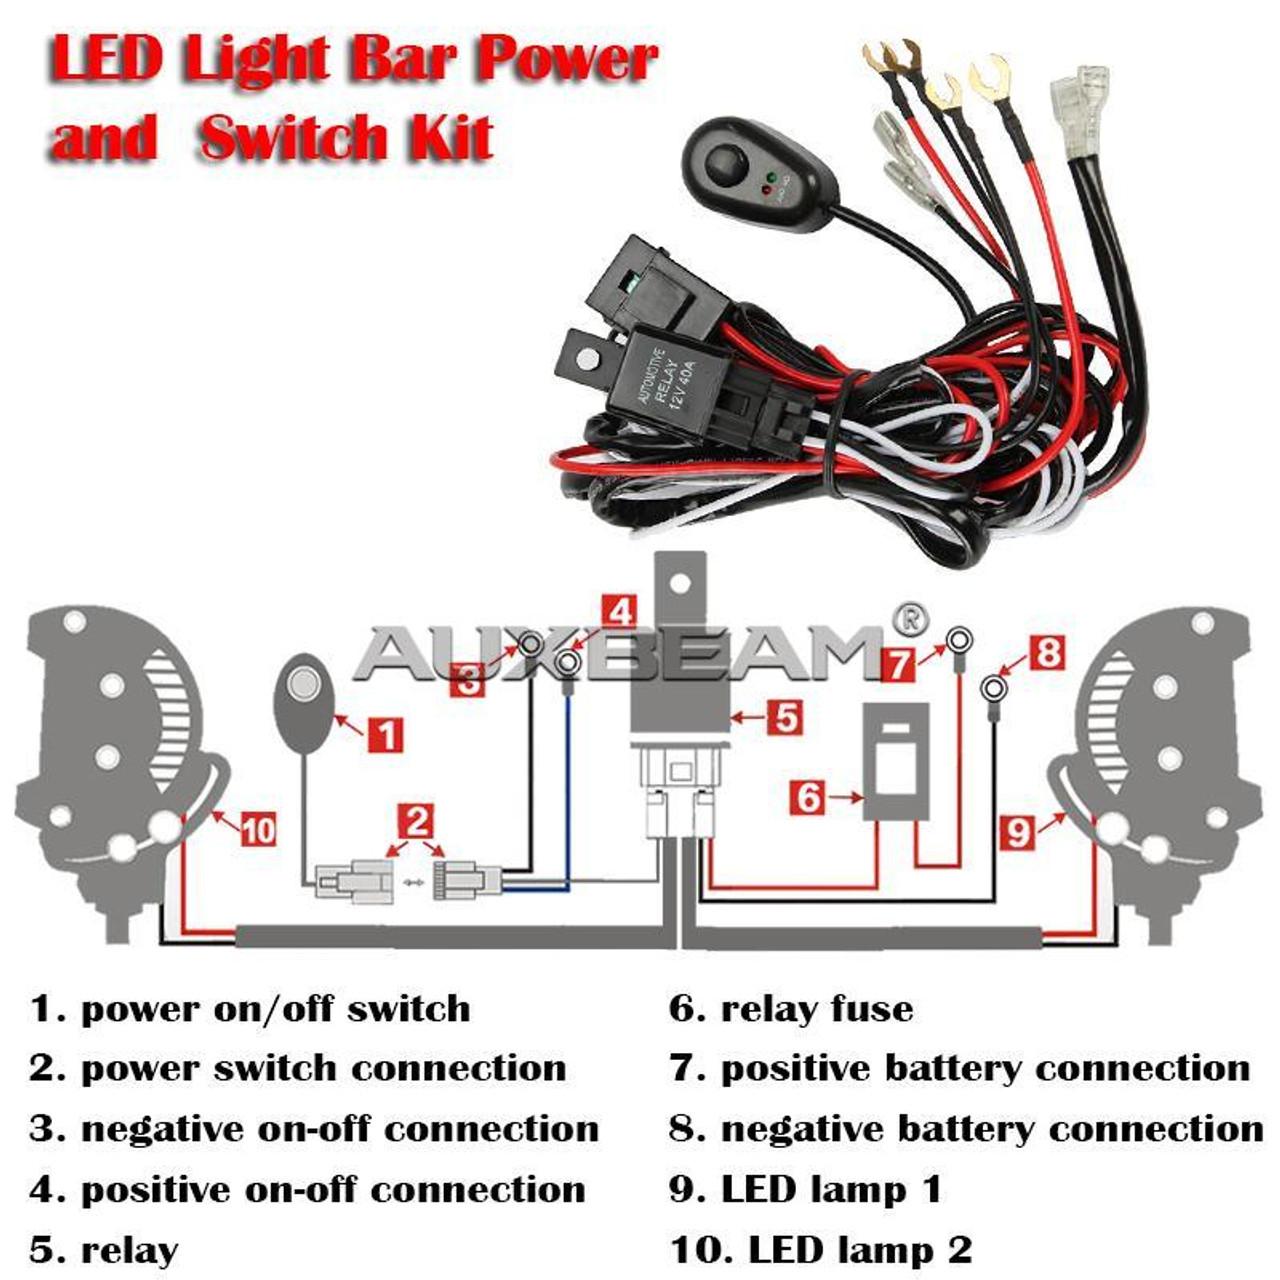 12v 40a led light bar wiring harness kit dual lights 12v 40a led light bar [ 1280 x 1280 Pixel ]